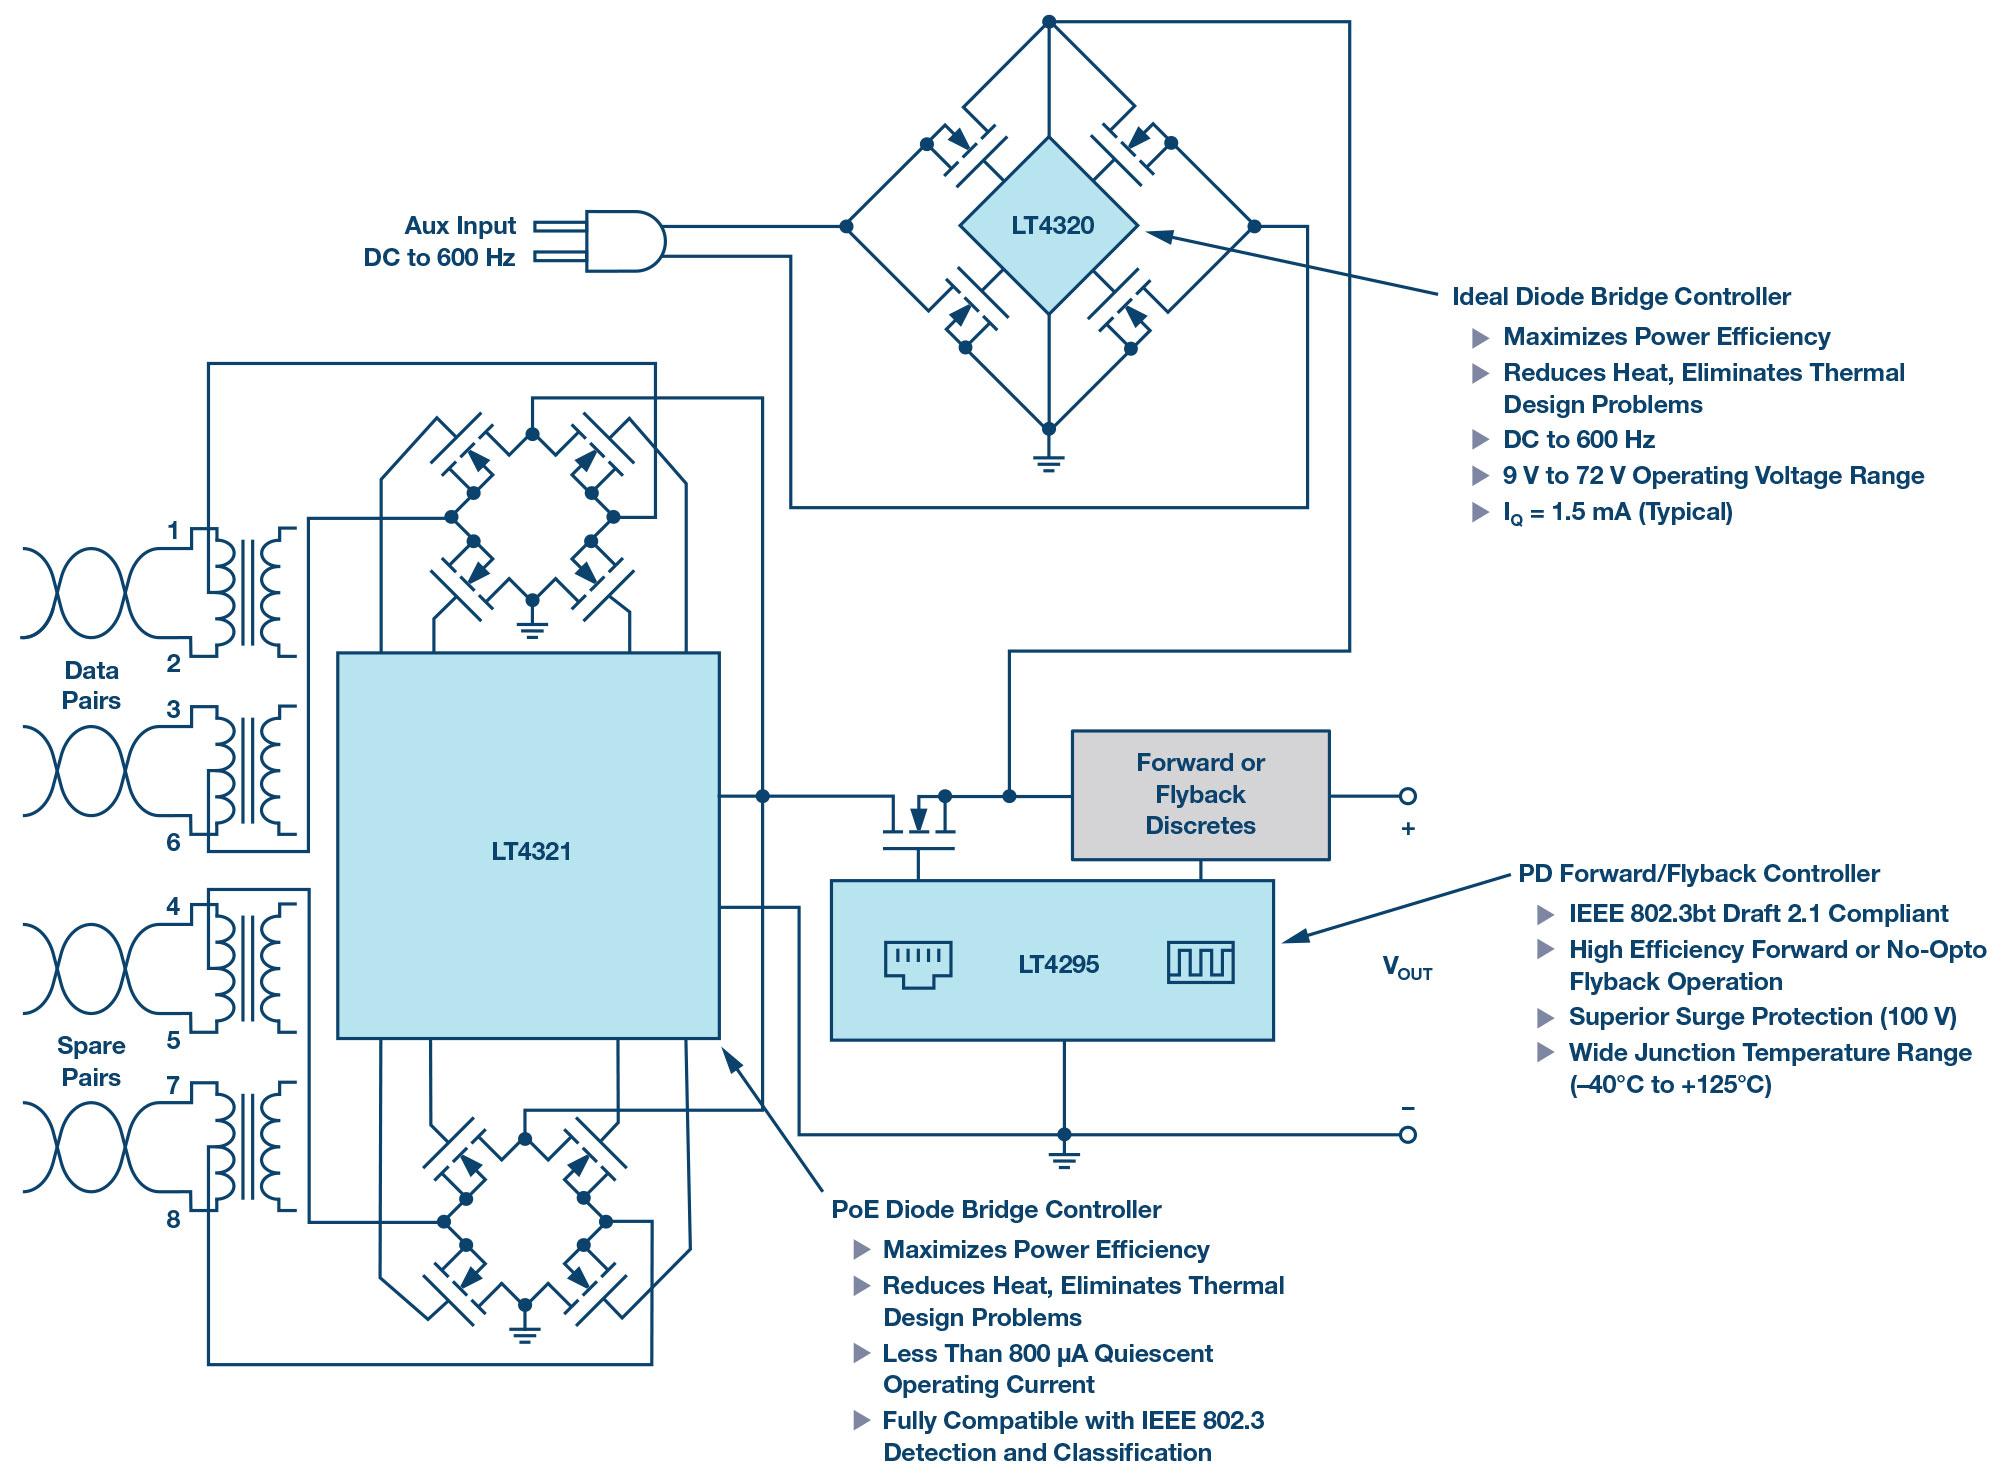 medium resolution of figure 71 power supply block diagrams wiring diagram data val figure 71 power supply block diagrams